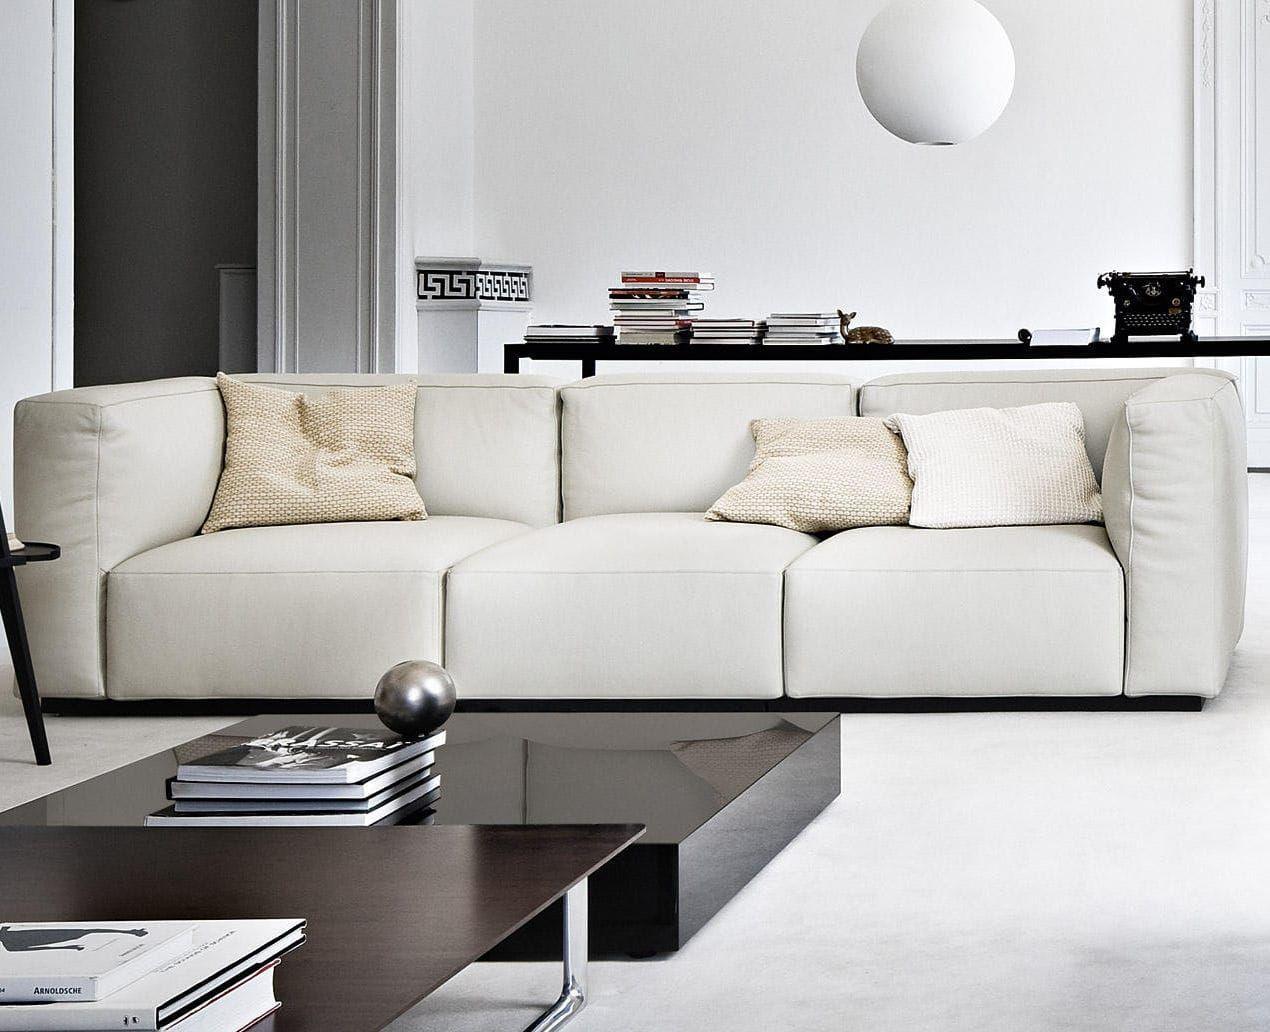 Corner Sofa Modular Contemporary Fabric 271 Mex Cube Cassina Modular Sofa Cassina Furniture Italian Furniture Brands